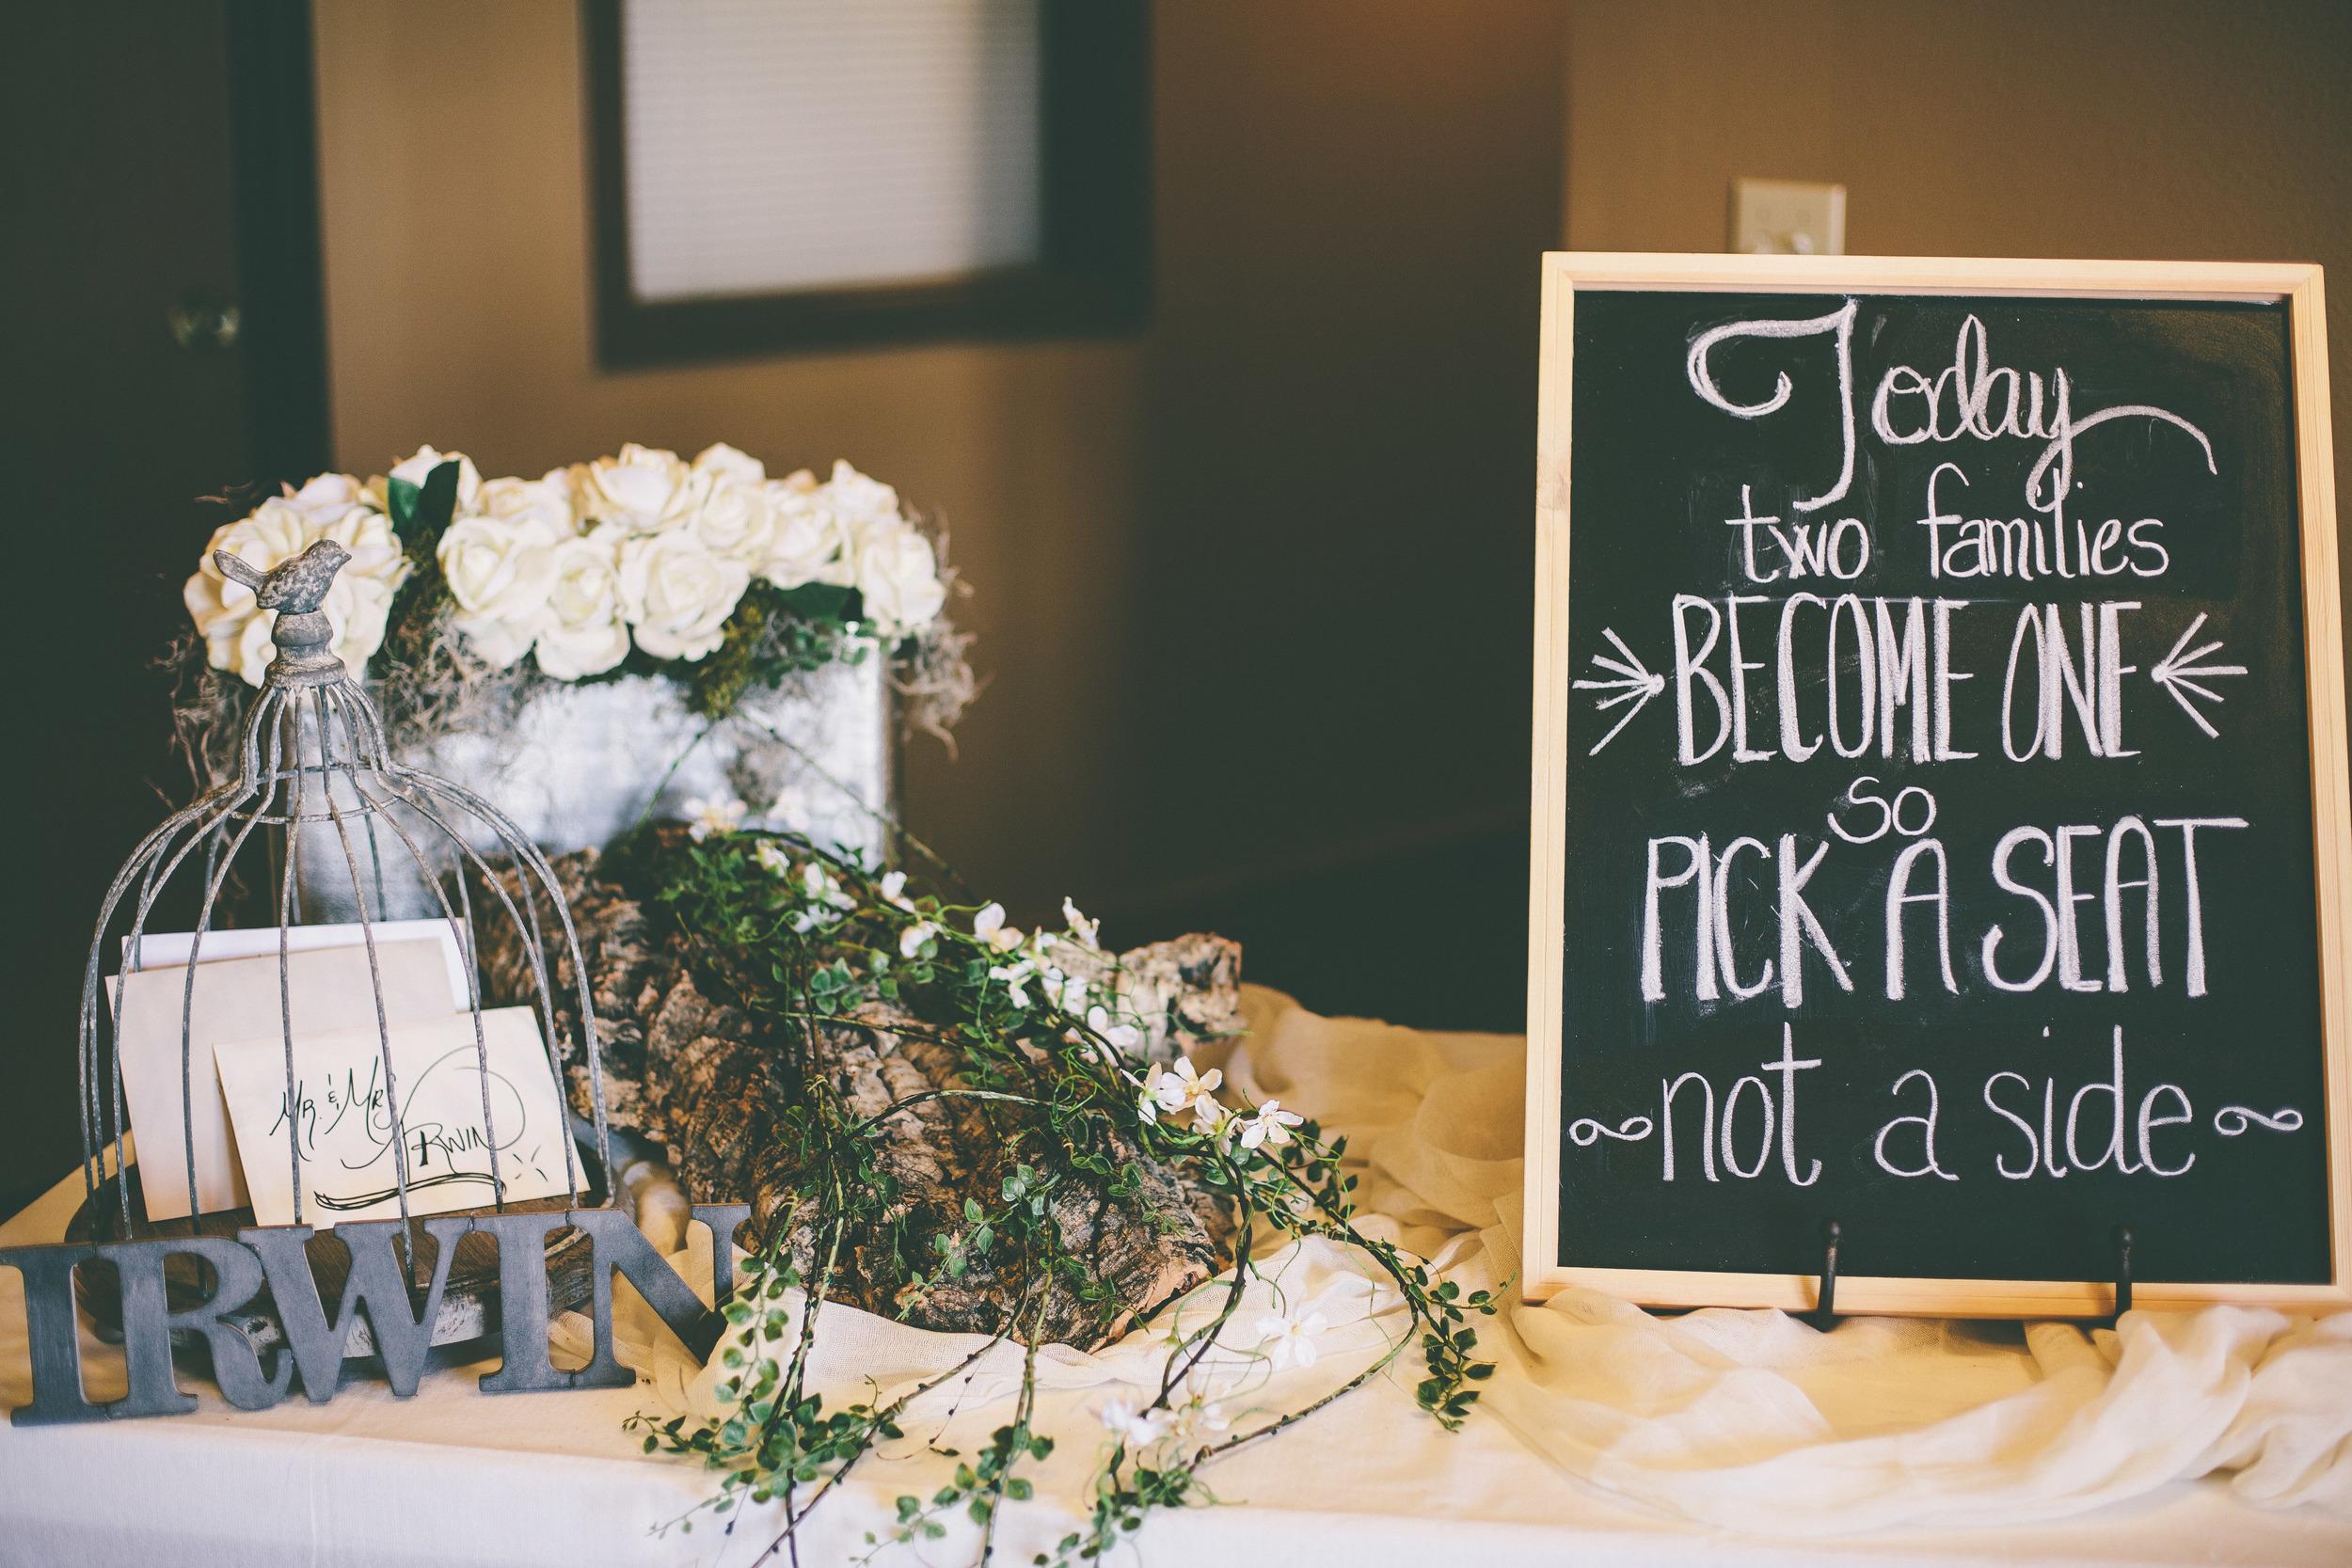 irwin wedding blog-1.jpg